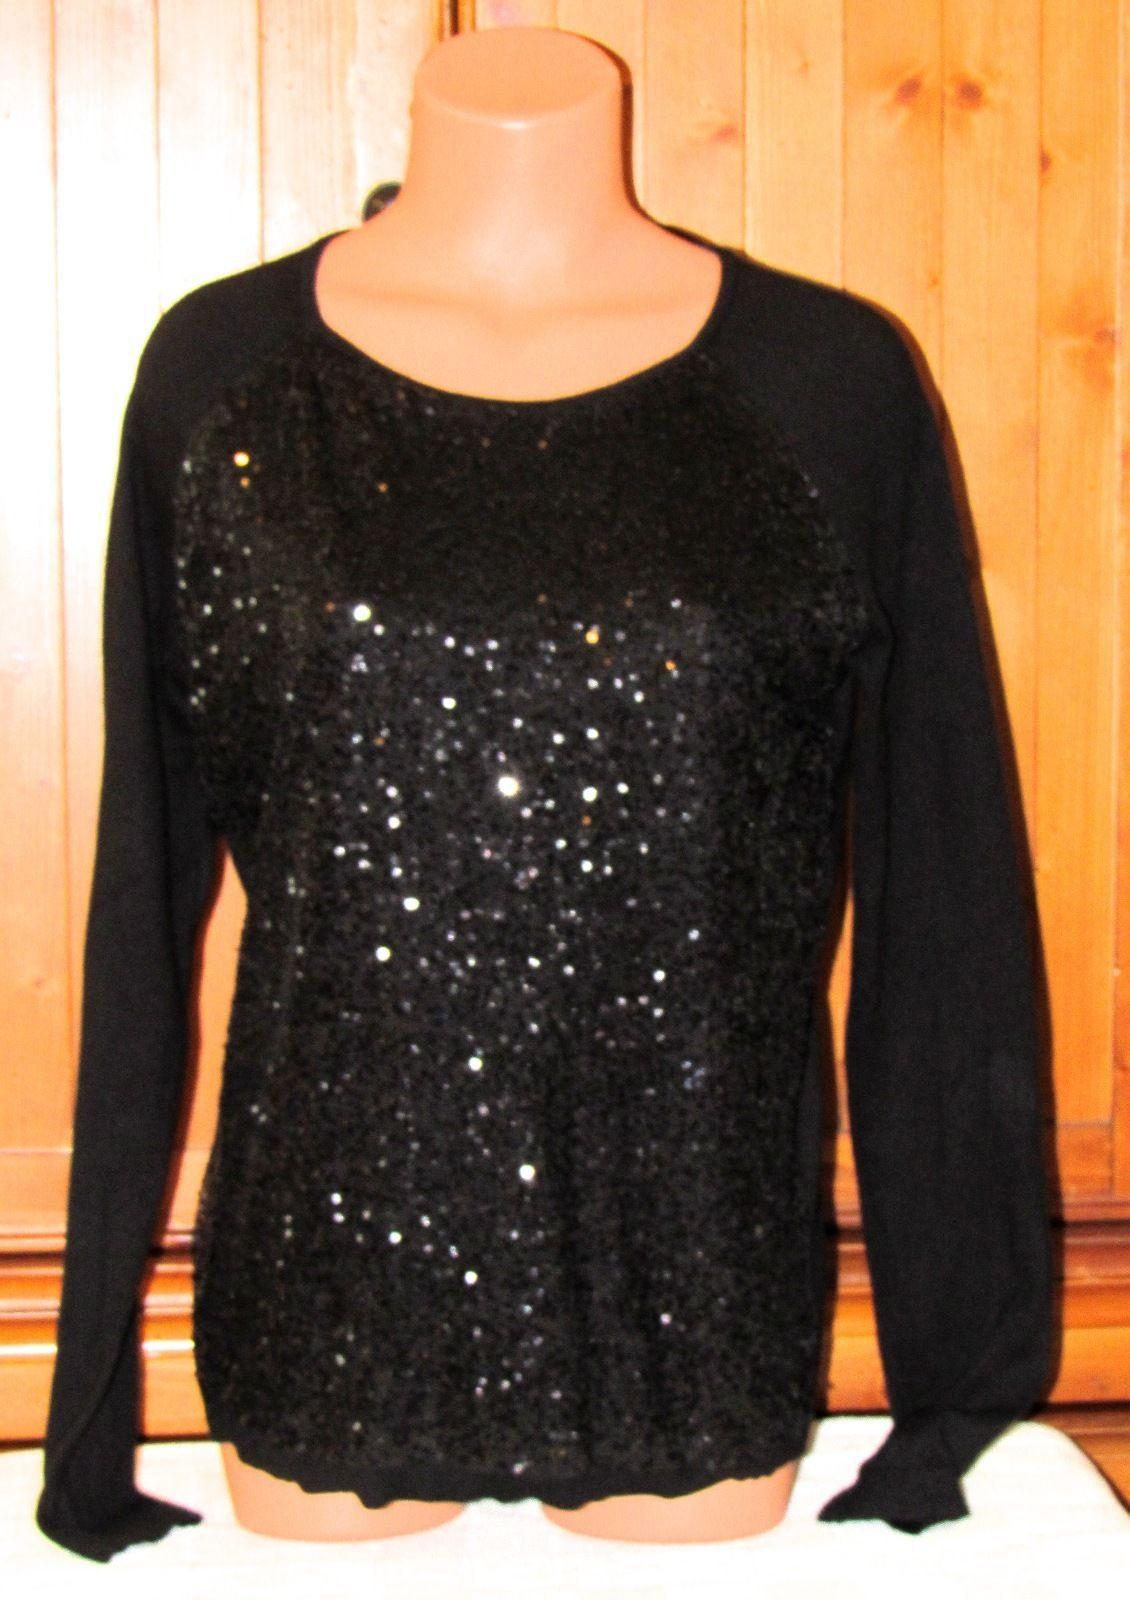 Elle Black Women's Black Pull-over Scoop Neck Cotton Sequin Sweater S: L